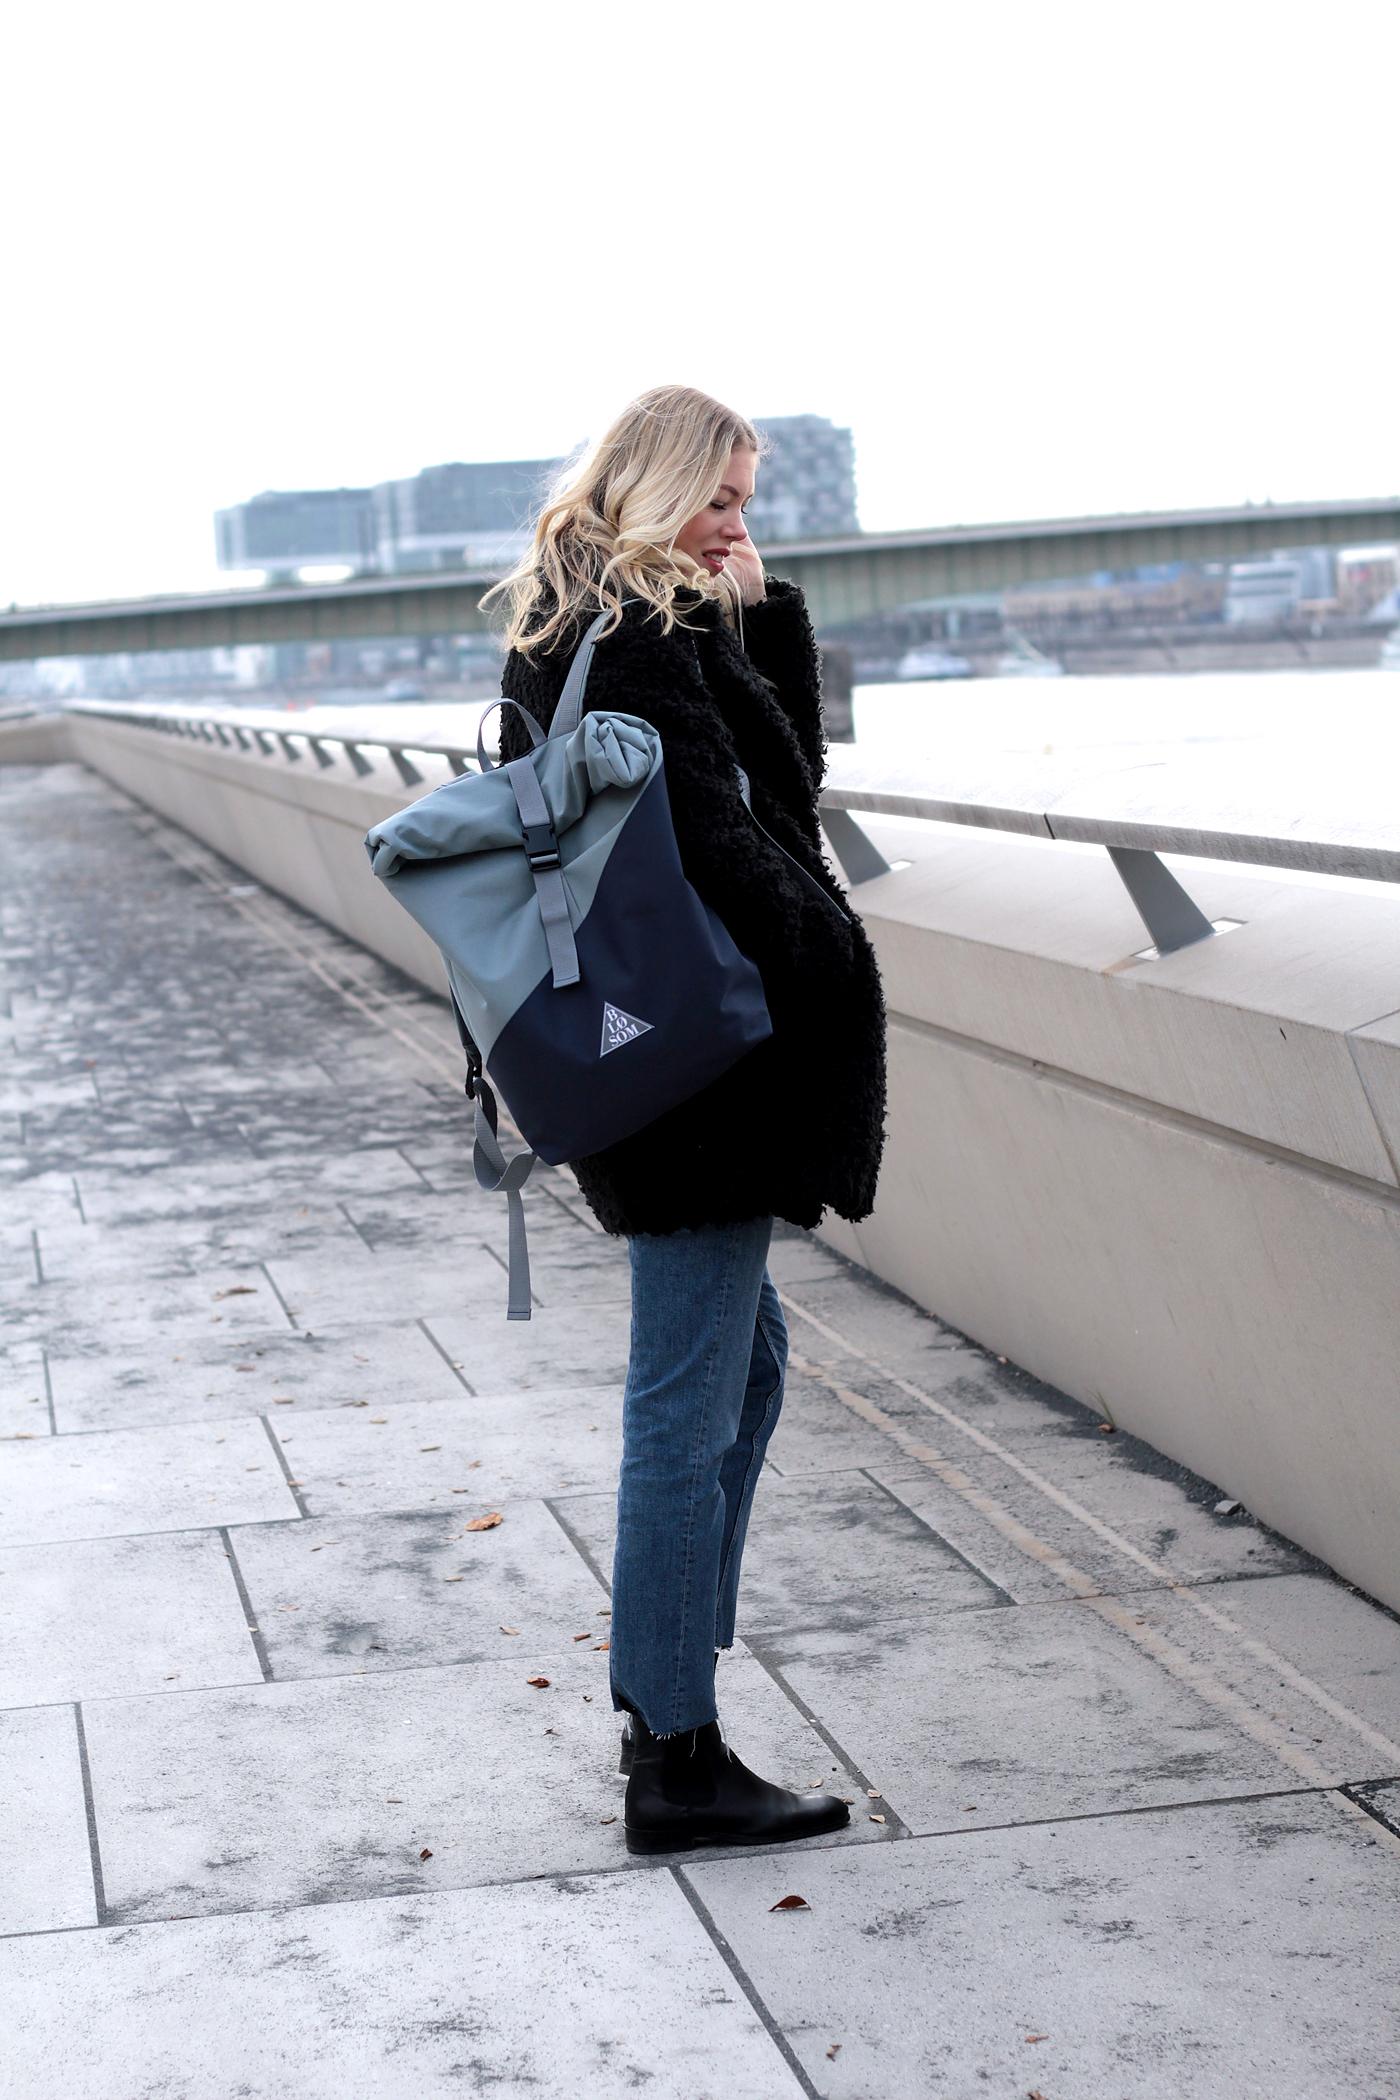 blosom_backpack_reiseblog_somehappyshoes_verenajulia_travel